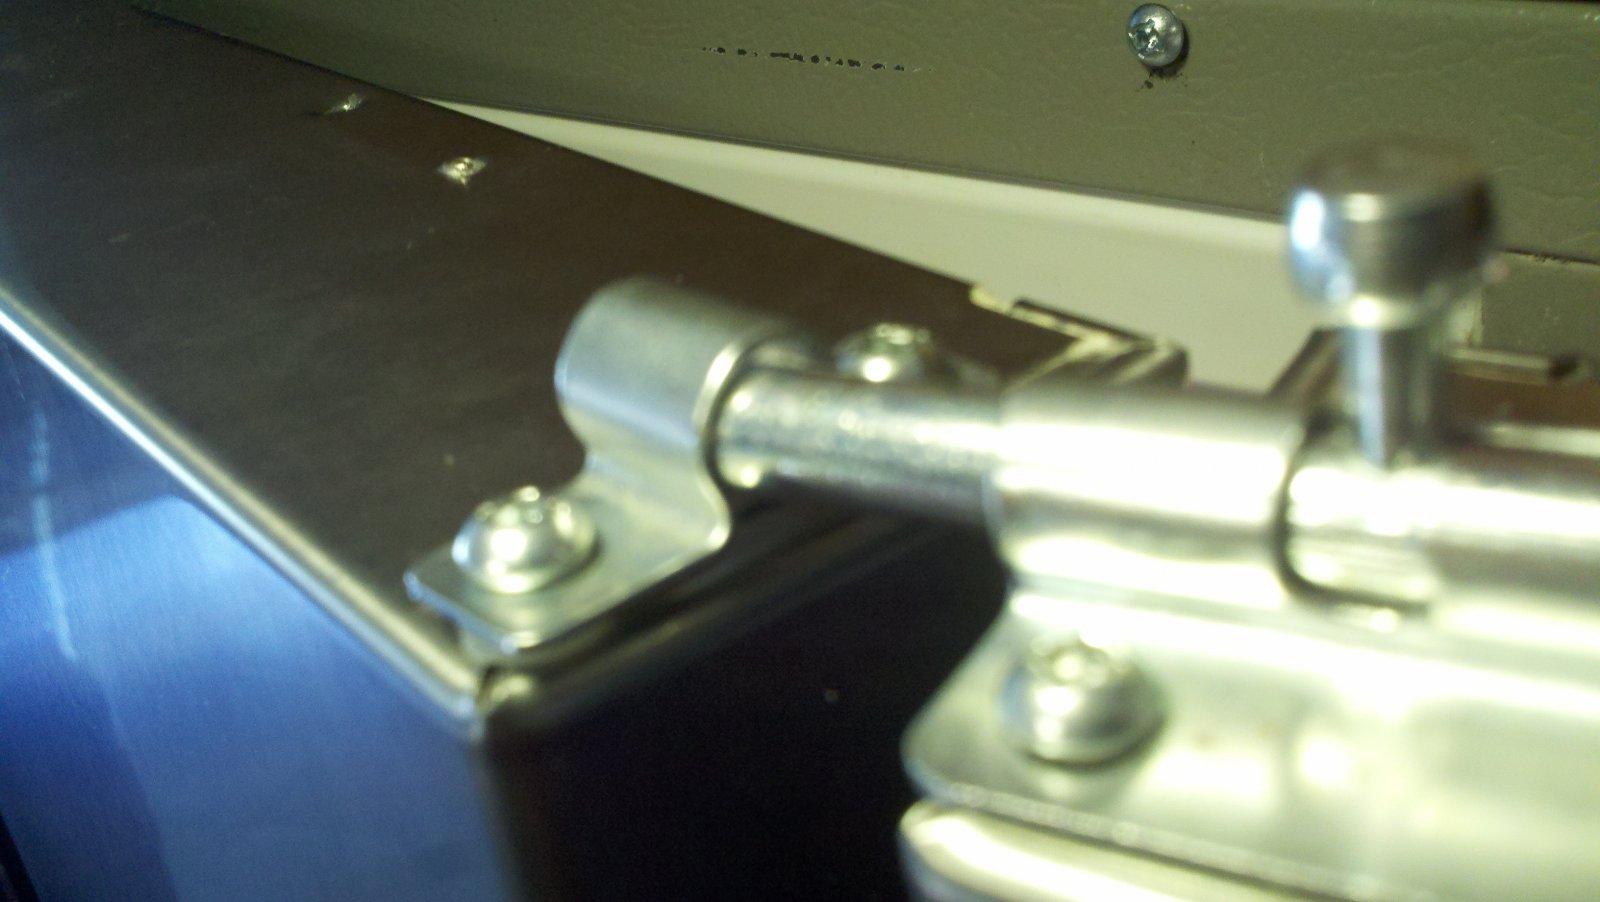 Click image for larger version  Name:fridge door latch 11-25-12.jpg Views:79 Size:143.8 KB ID:32175